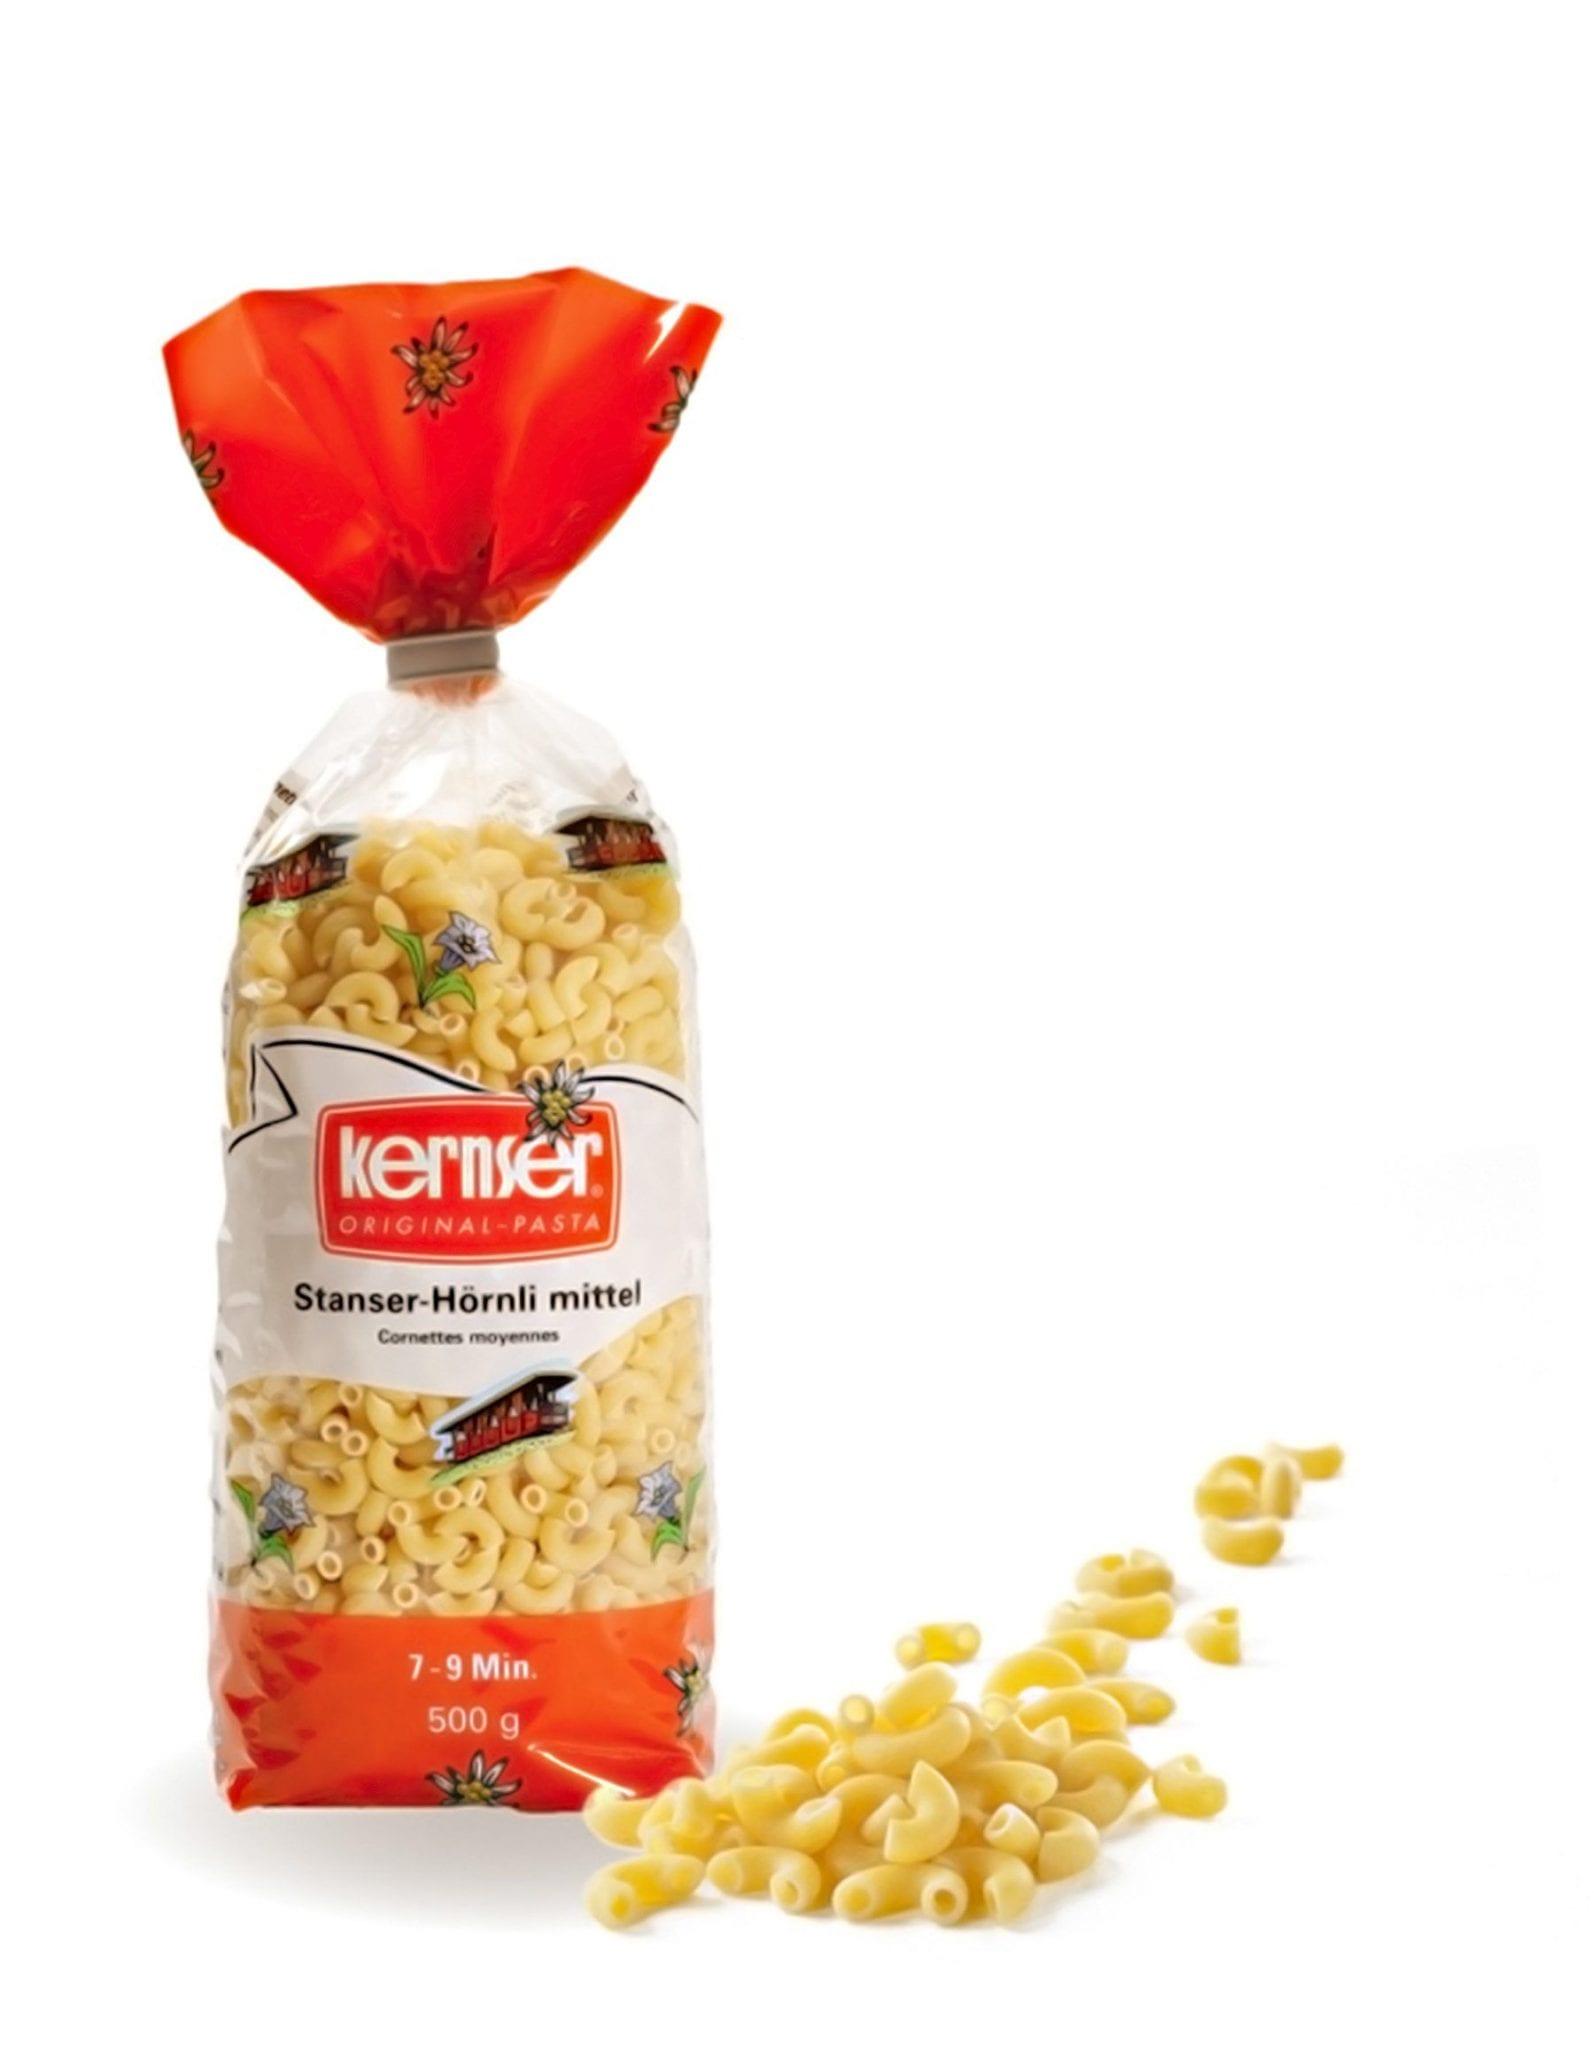 Kernser Pasta Specialties